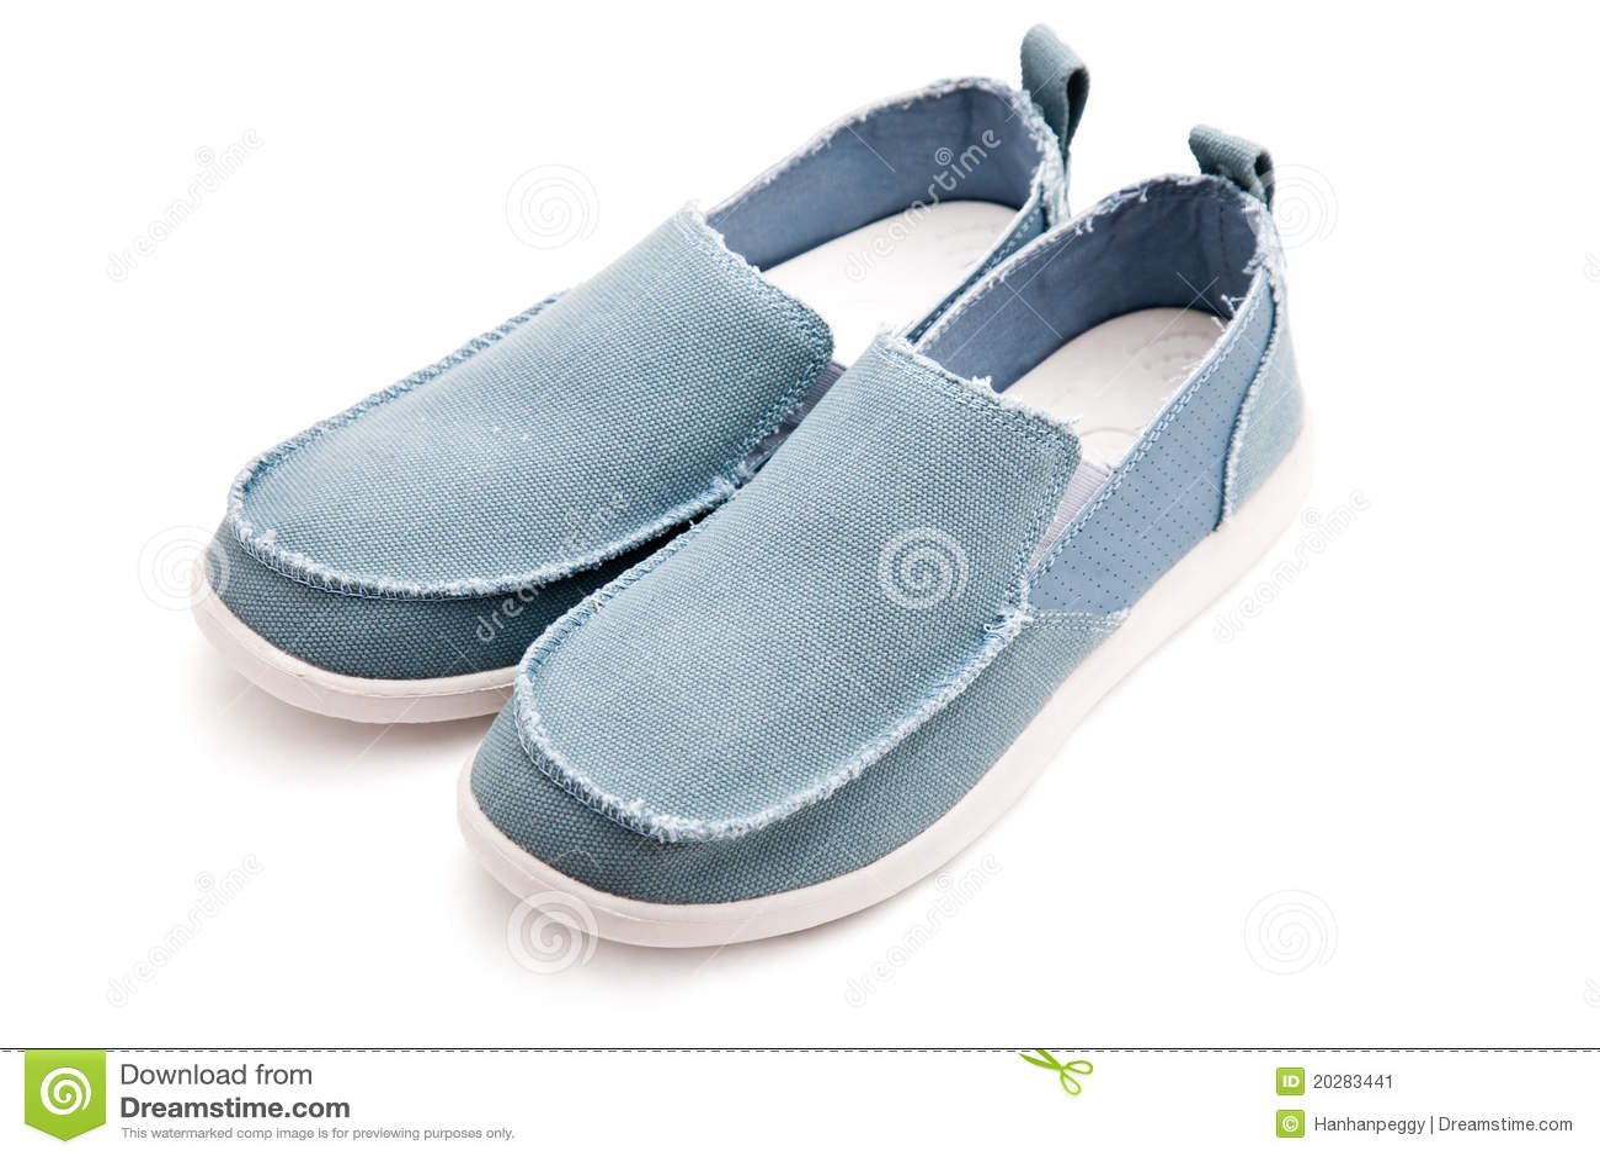 cc144ac85bc Download περιστασιακά παπούτσια α στοκ εικόνα. εικόνα από σύγχρονος -  20283441